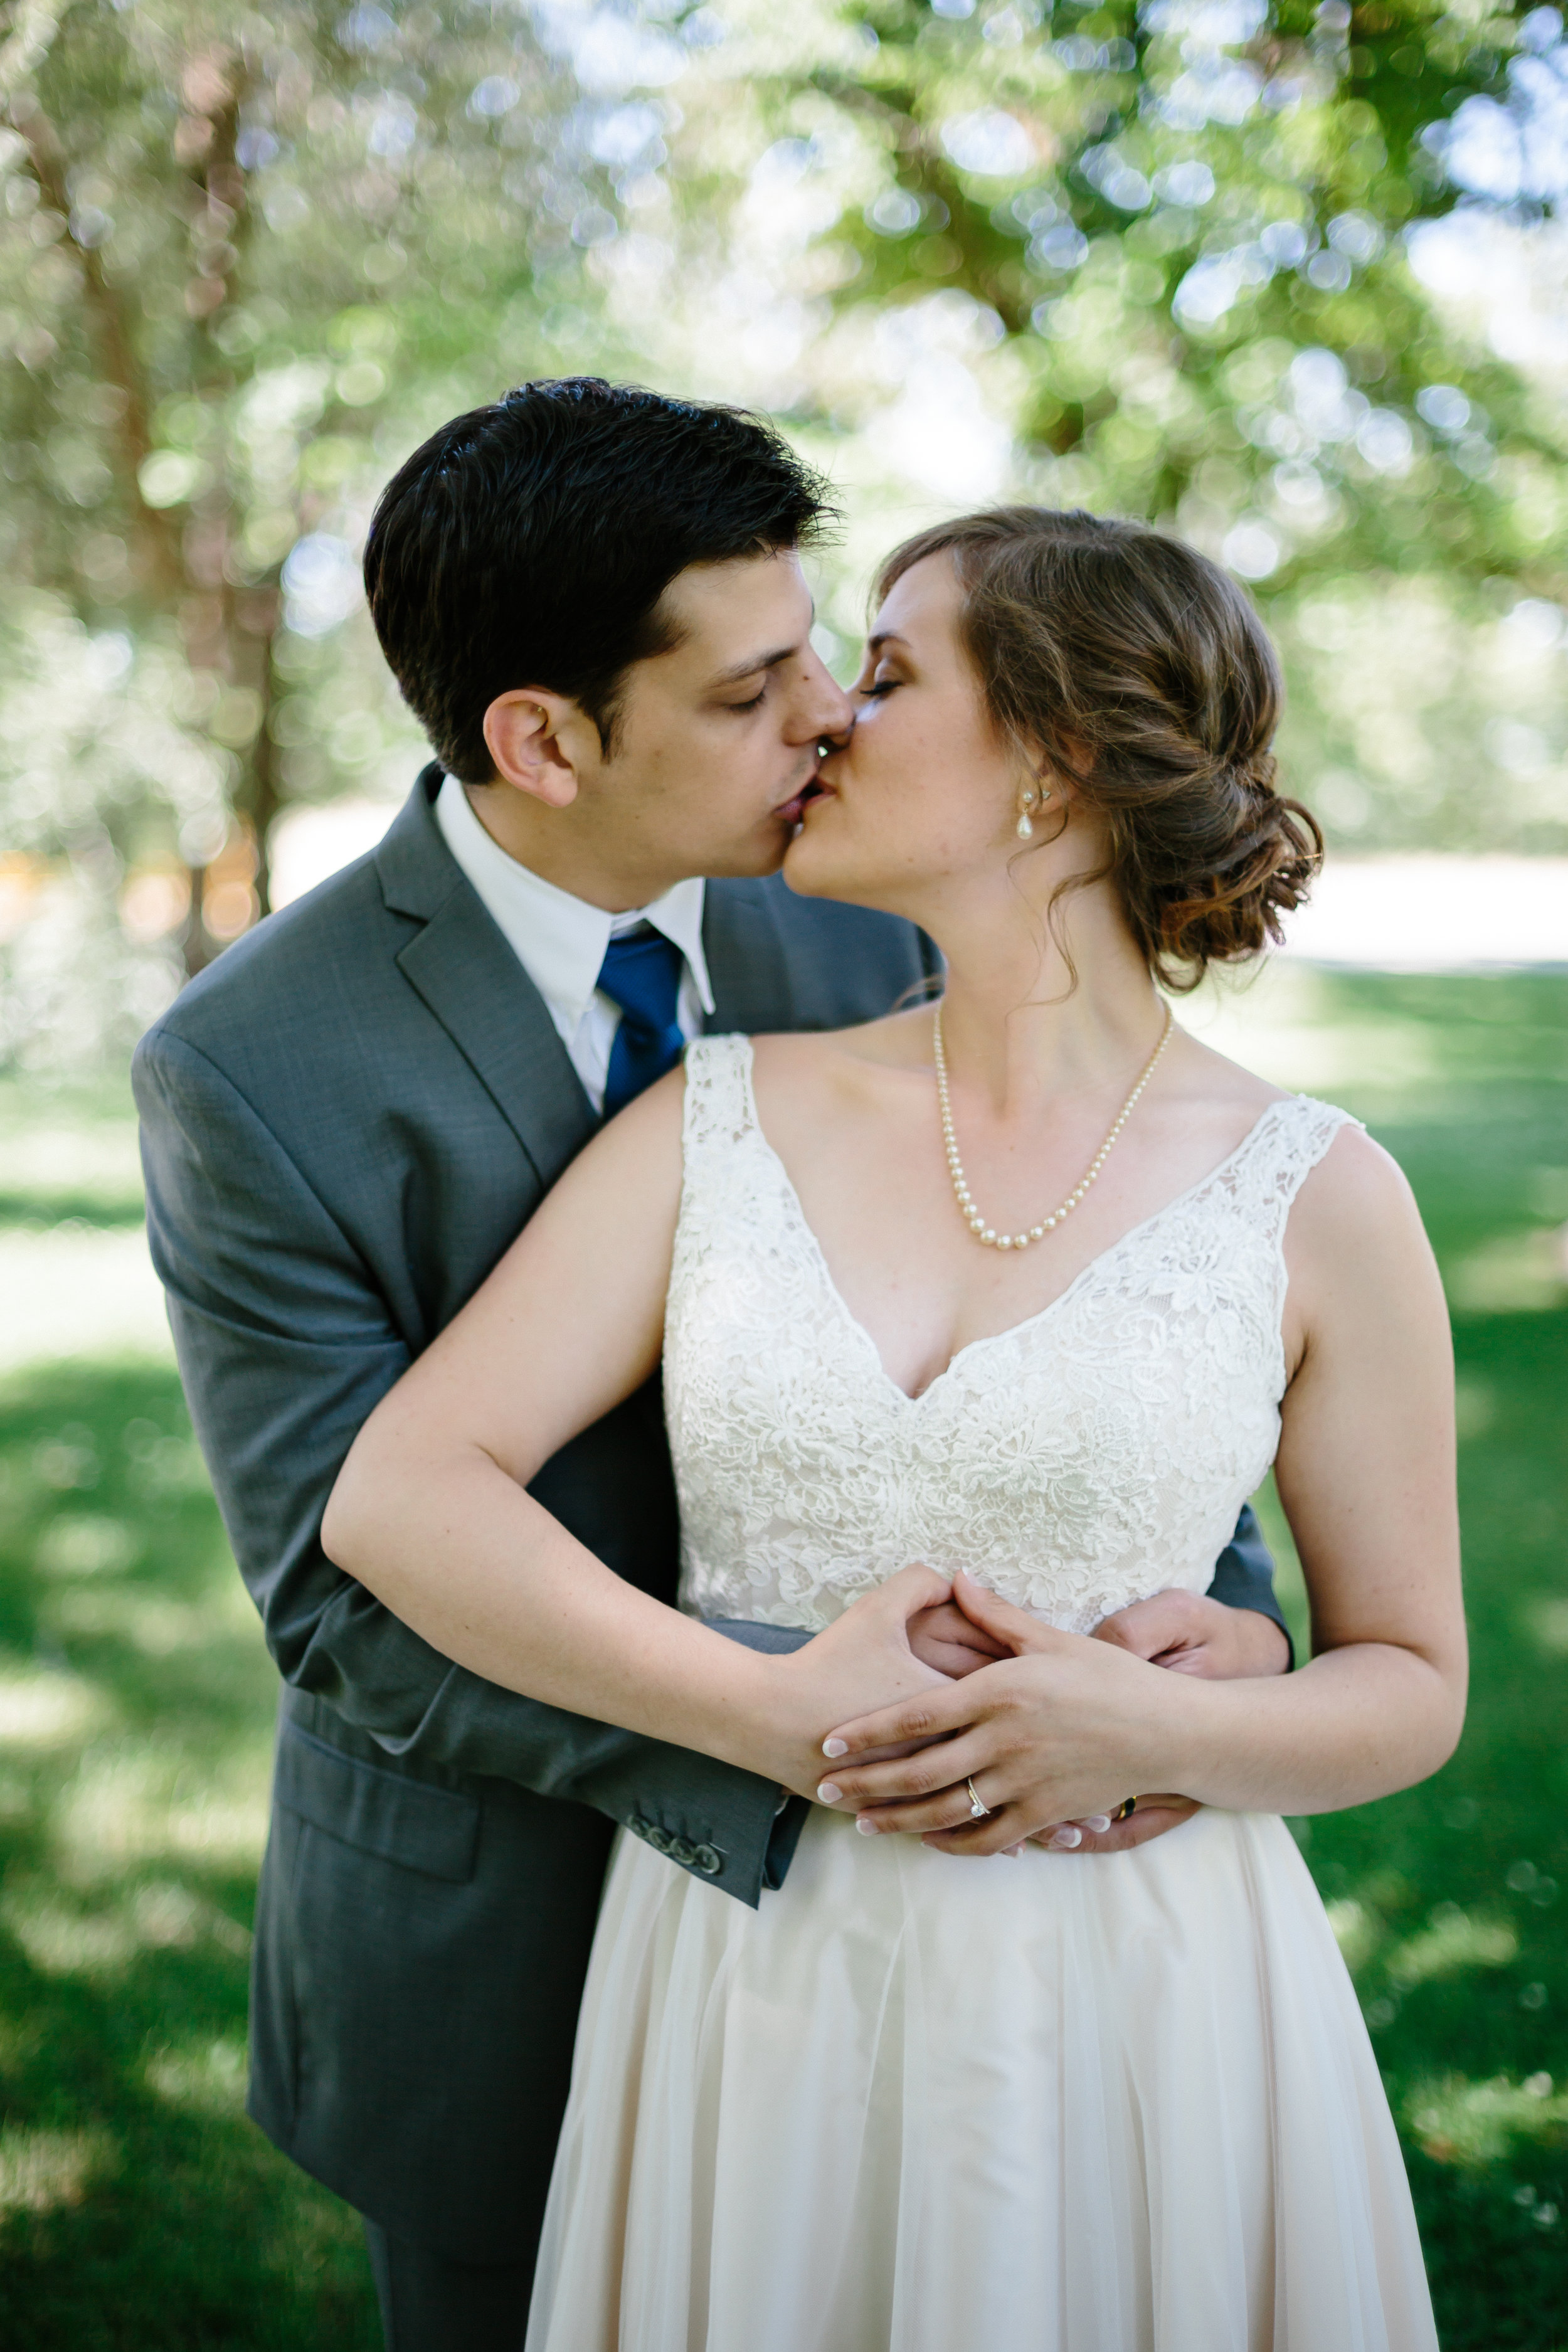 Jordan & Shantel Married - Idaho - Corrie Mick Photography-106.jpg